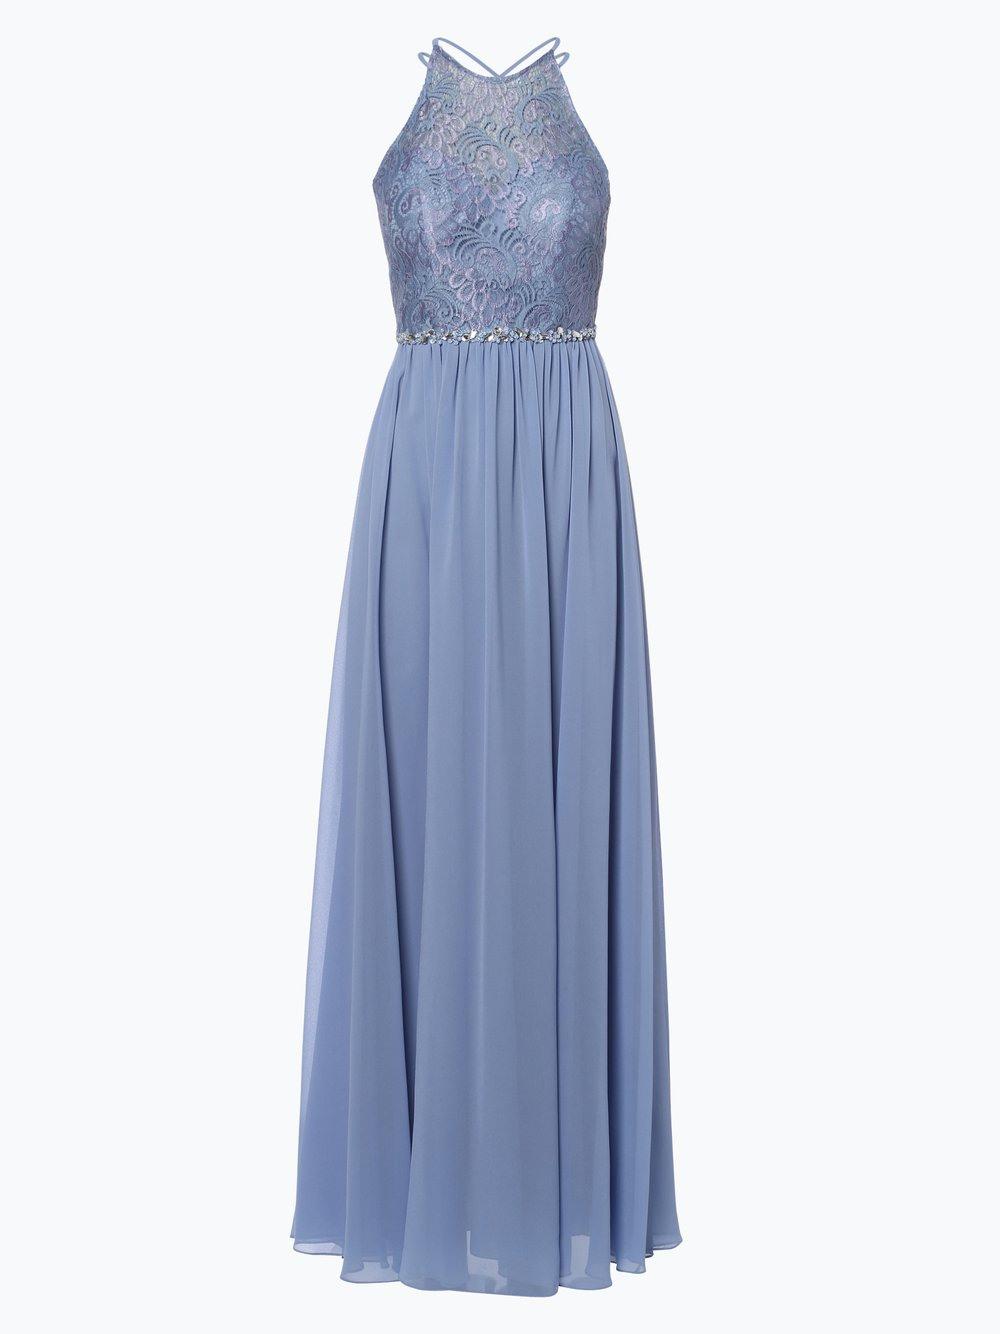 Abend Coolste Abendkleid Damen Lang Boutique10 Spektakulär Abendkleid Damen Lang Vertrieb